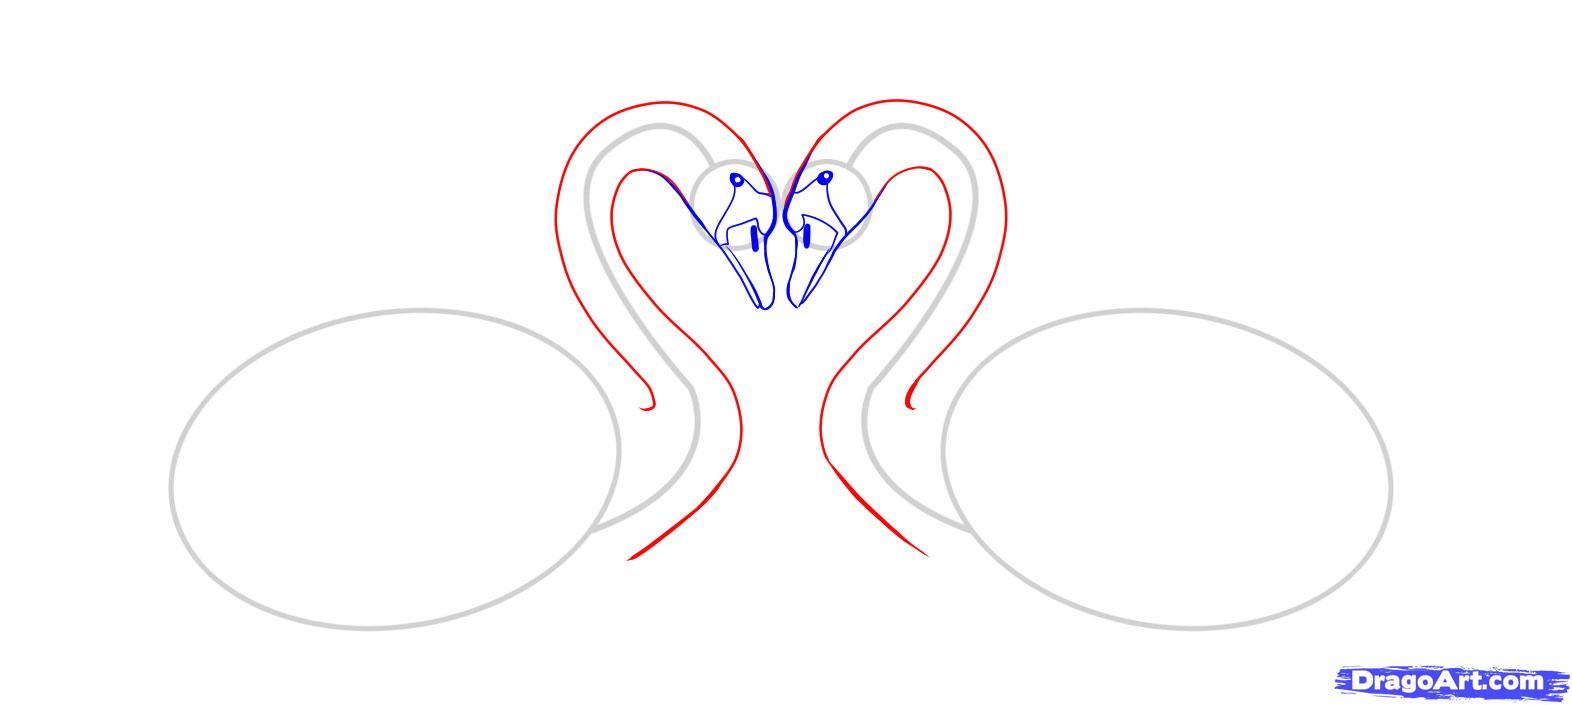 Рисуем двух лебедей - шаг 4